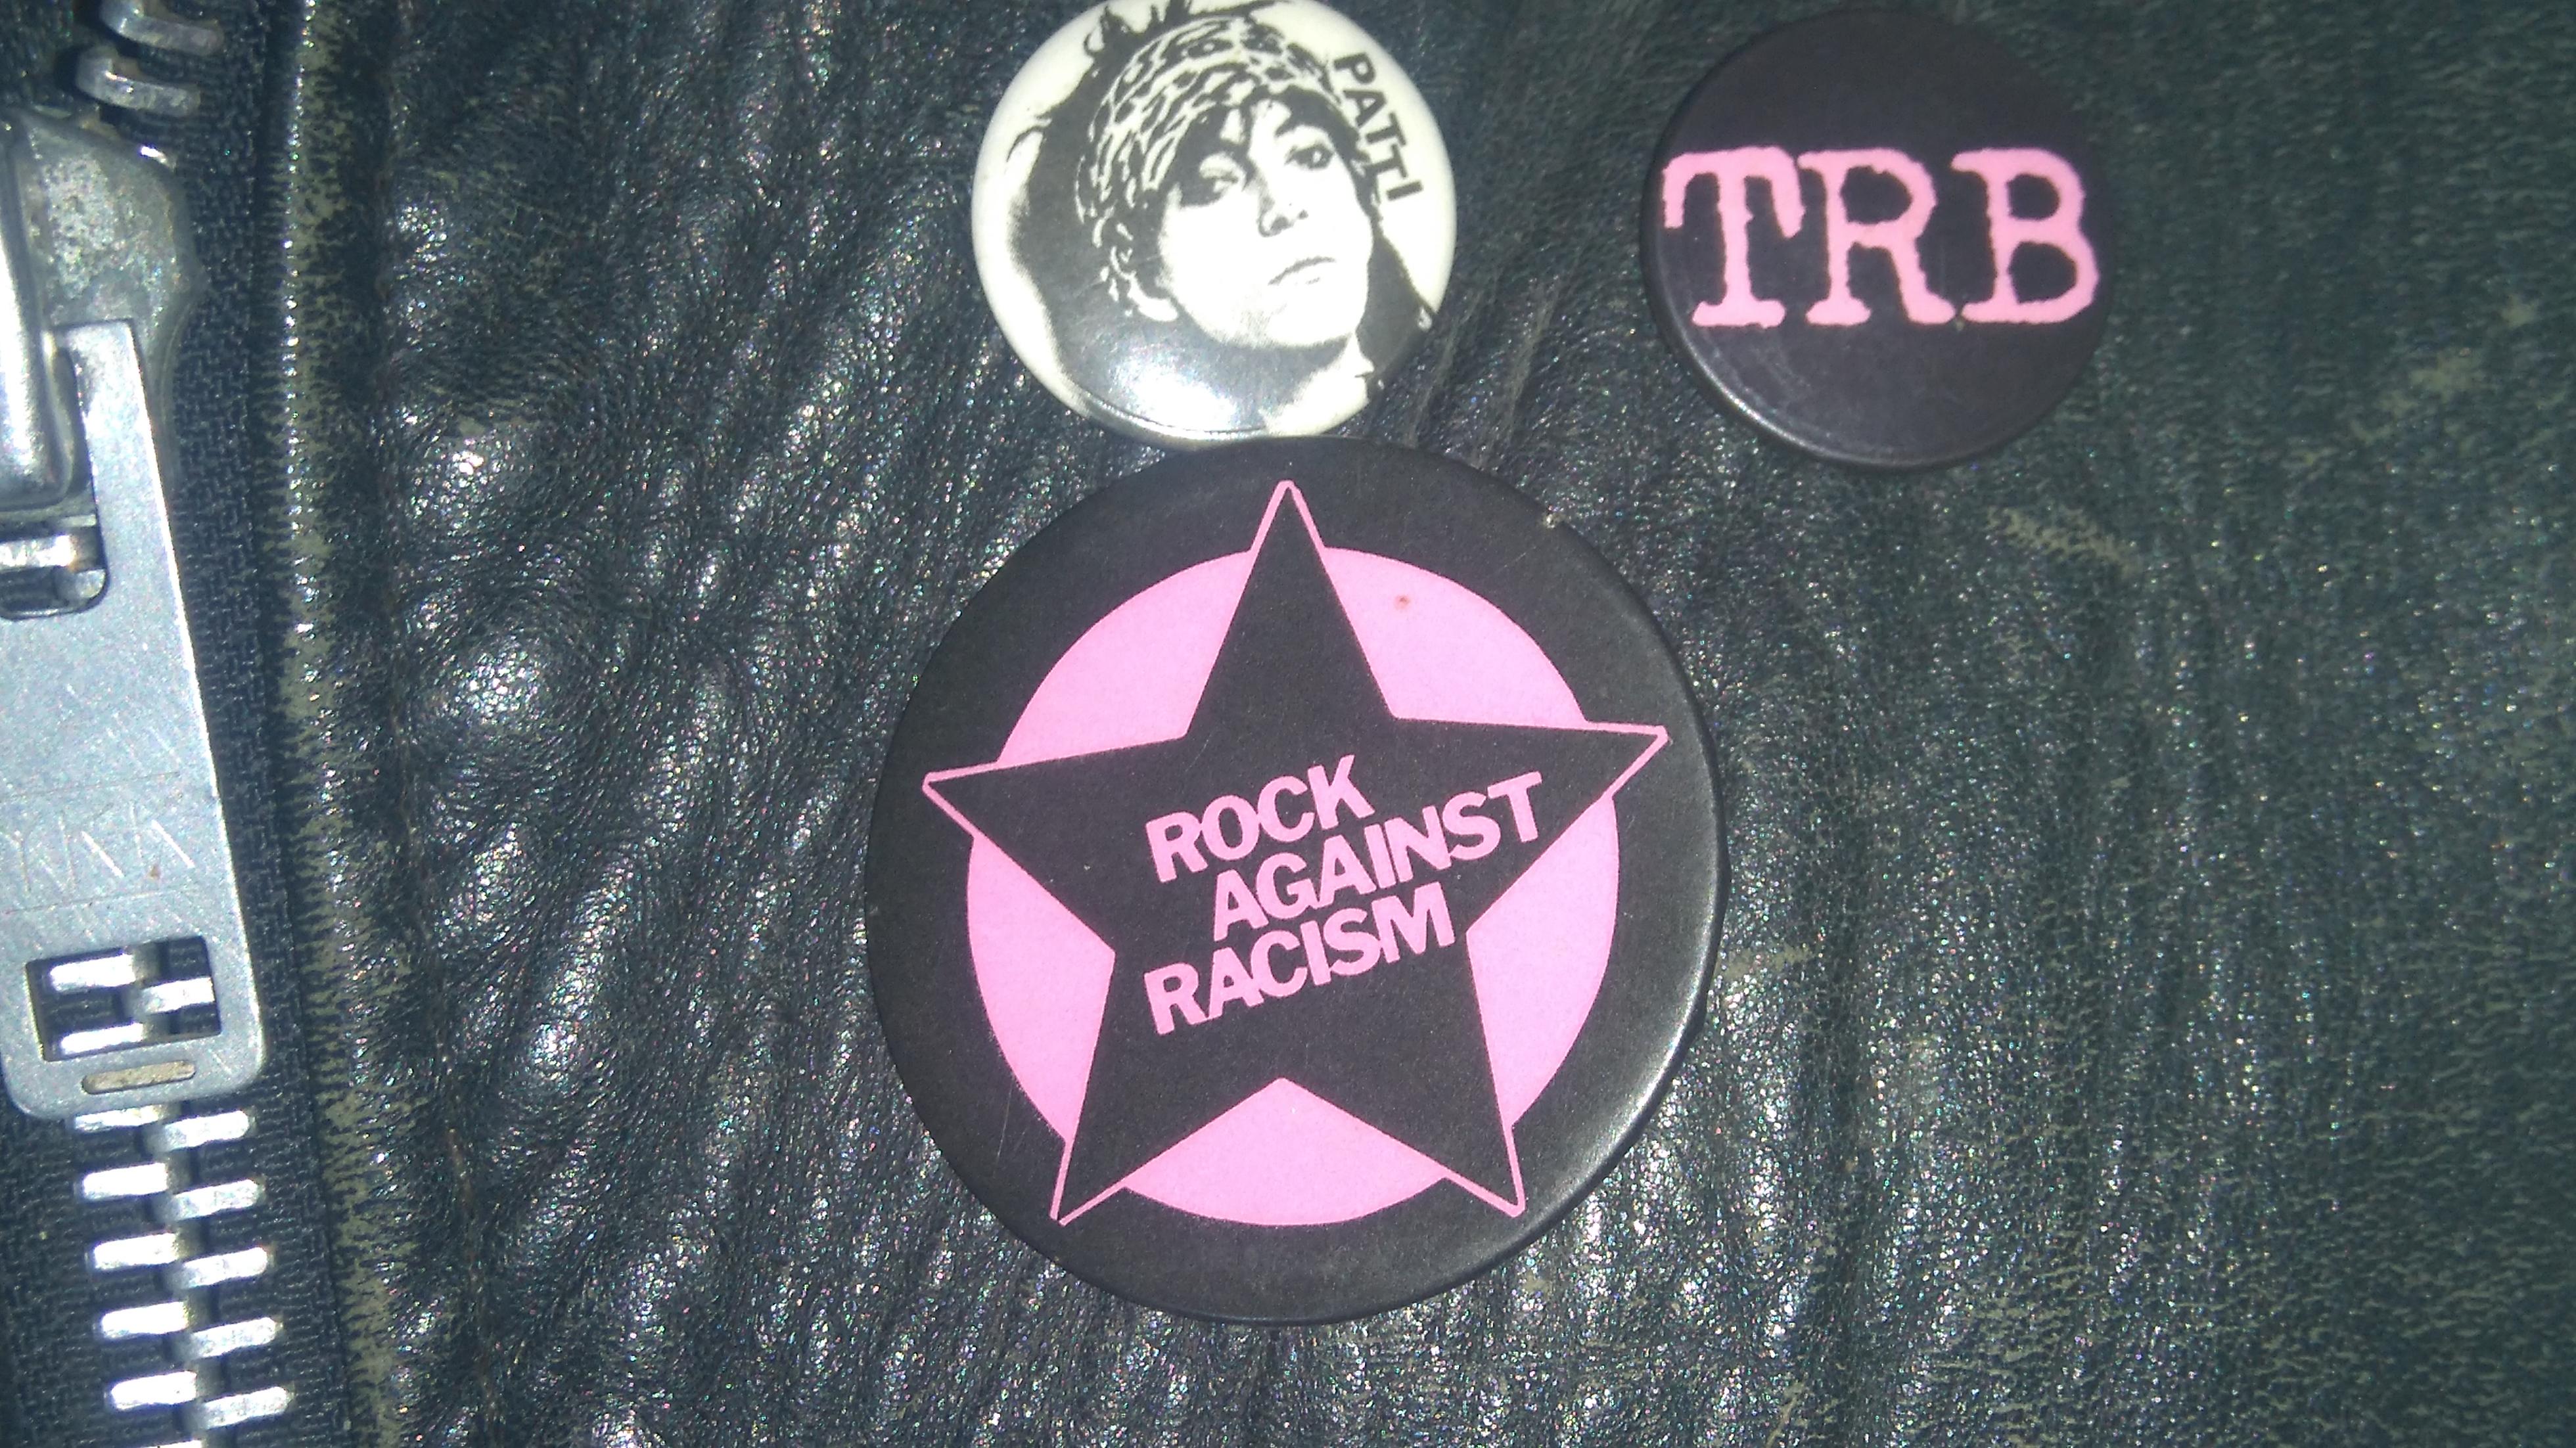 40 Years of Punk Rock Attitude